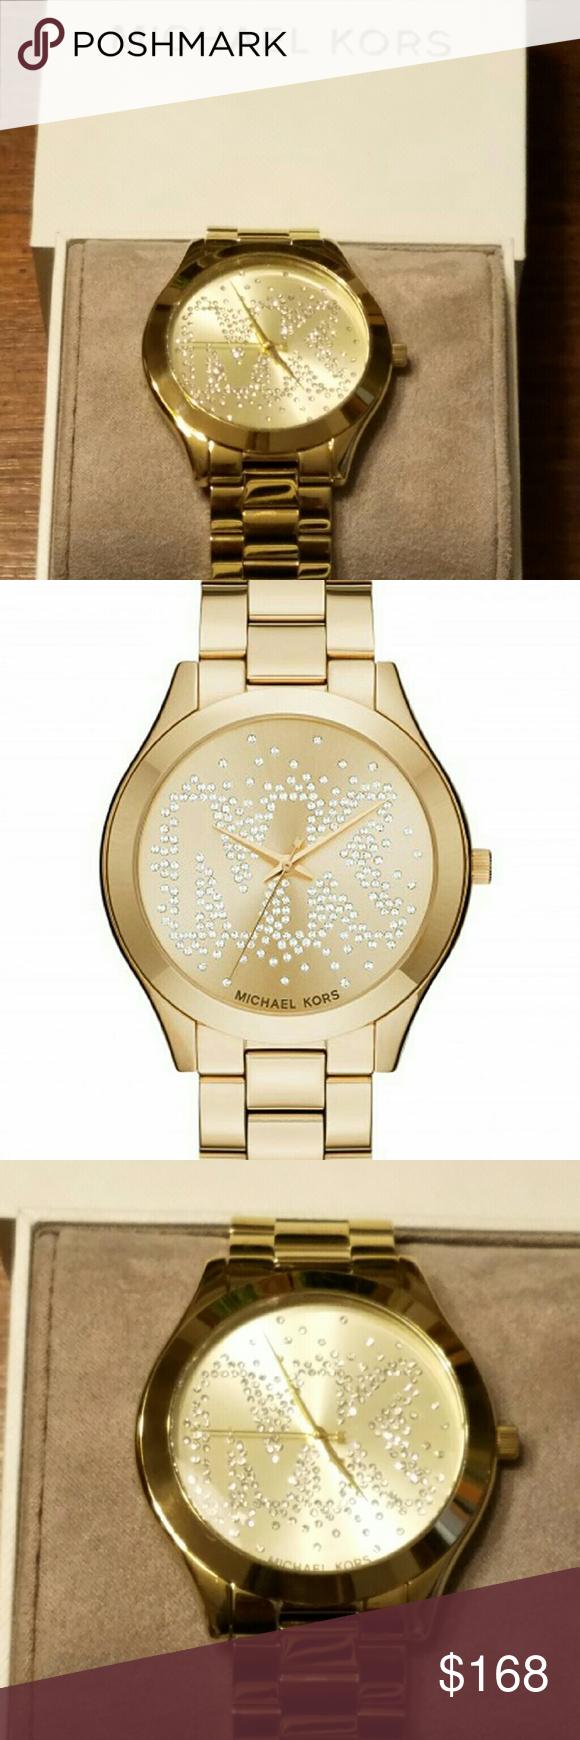 278a93bea7b4 Michael Kors Slim Runway Ladies Watch MK3590 New with tag in box MK LOGO in  crystal